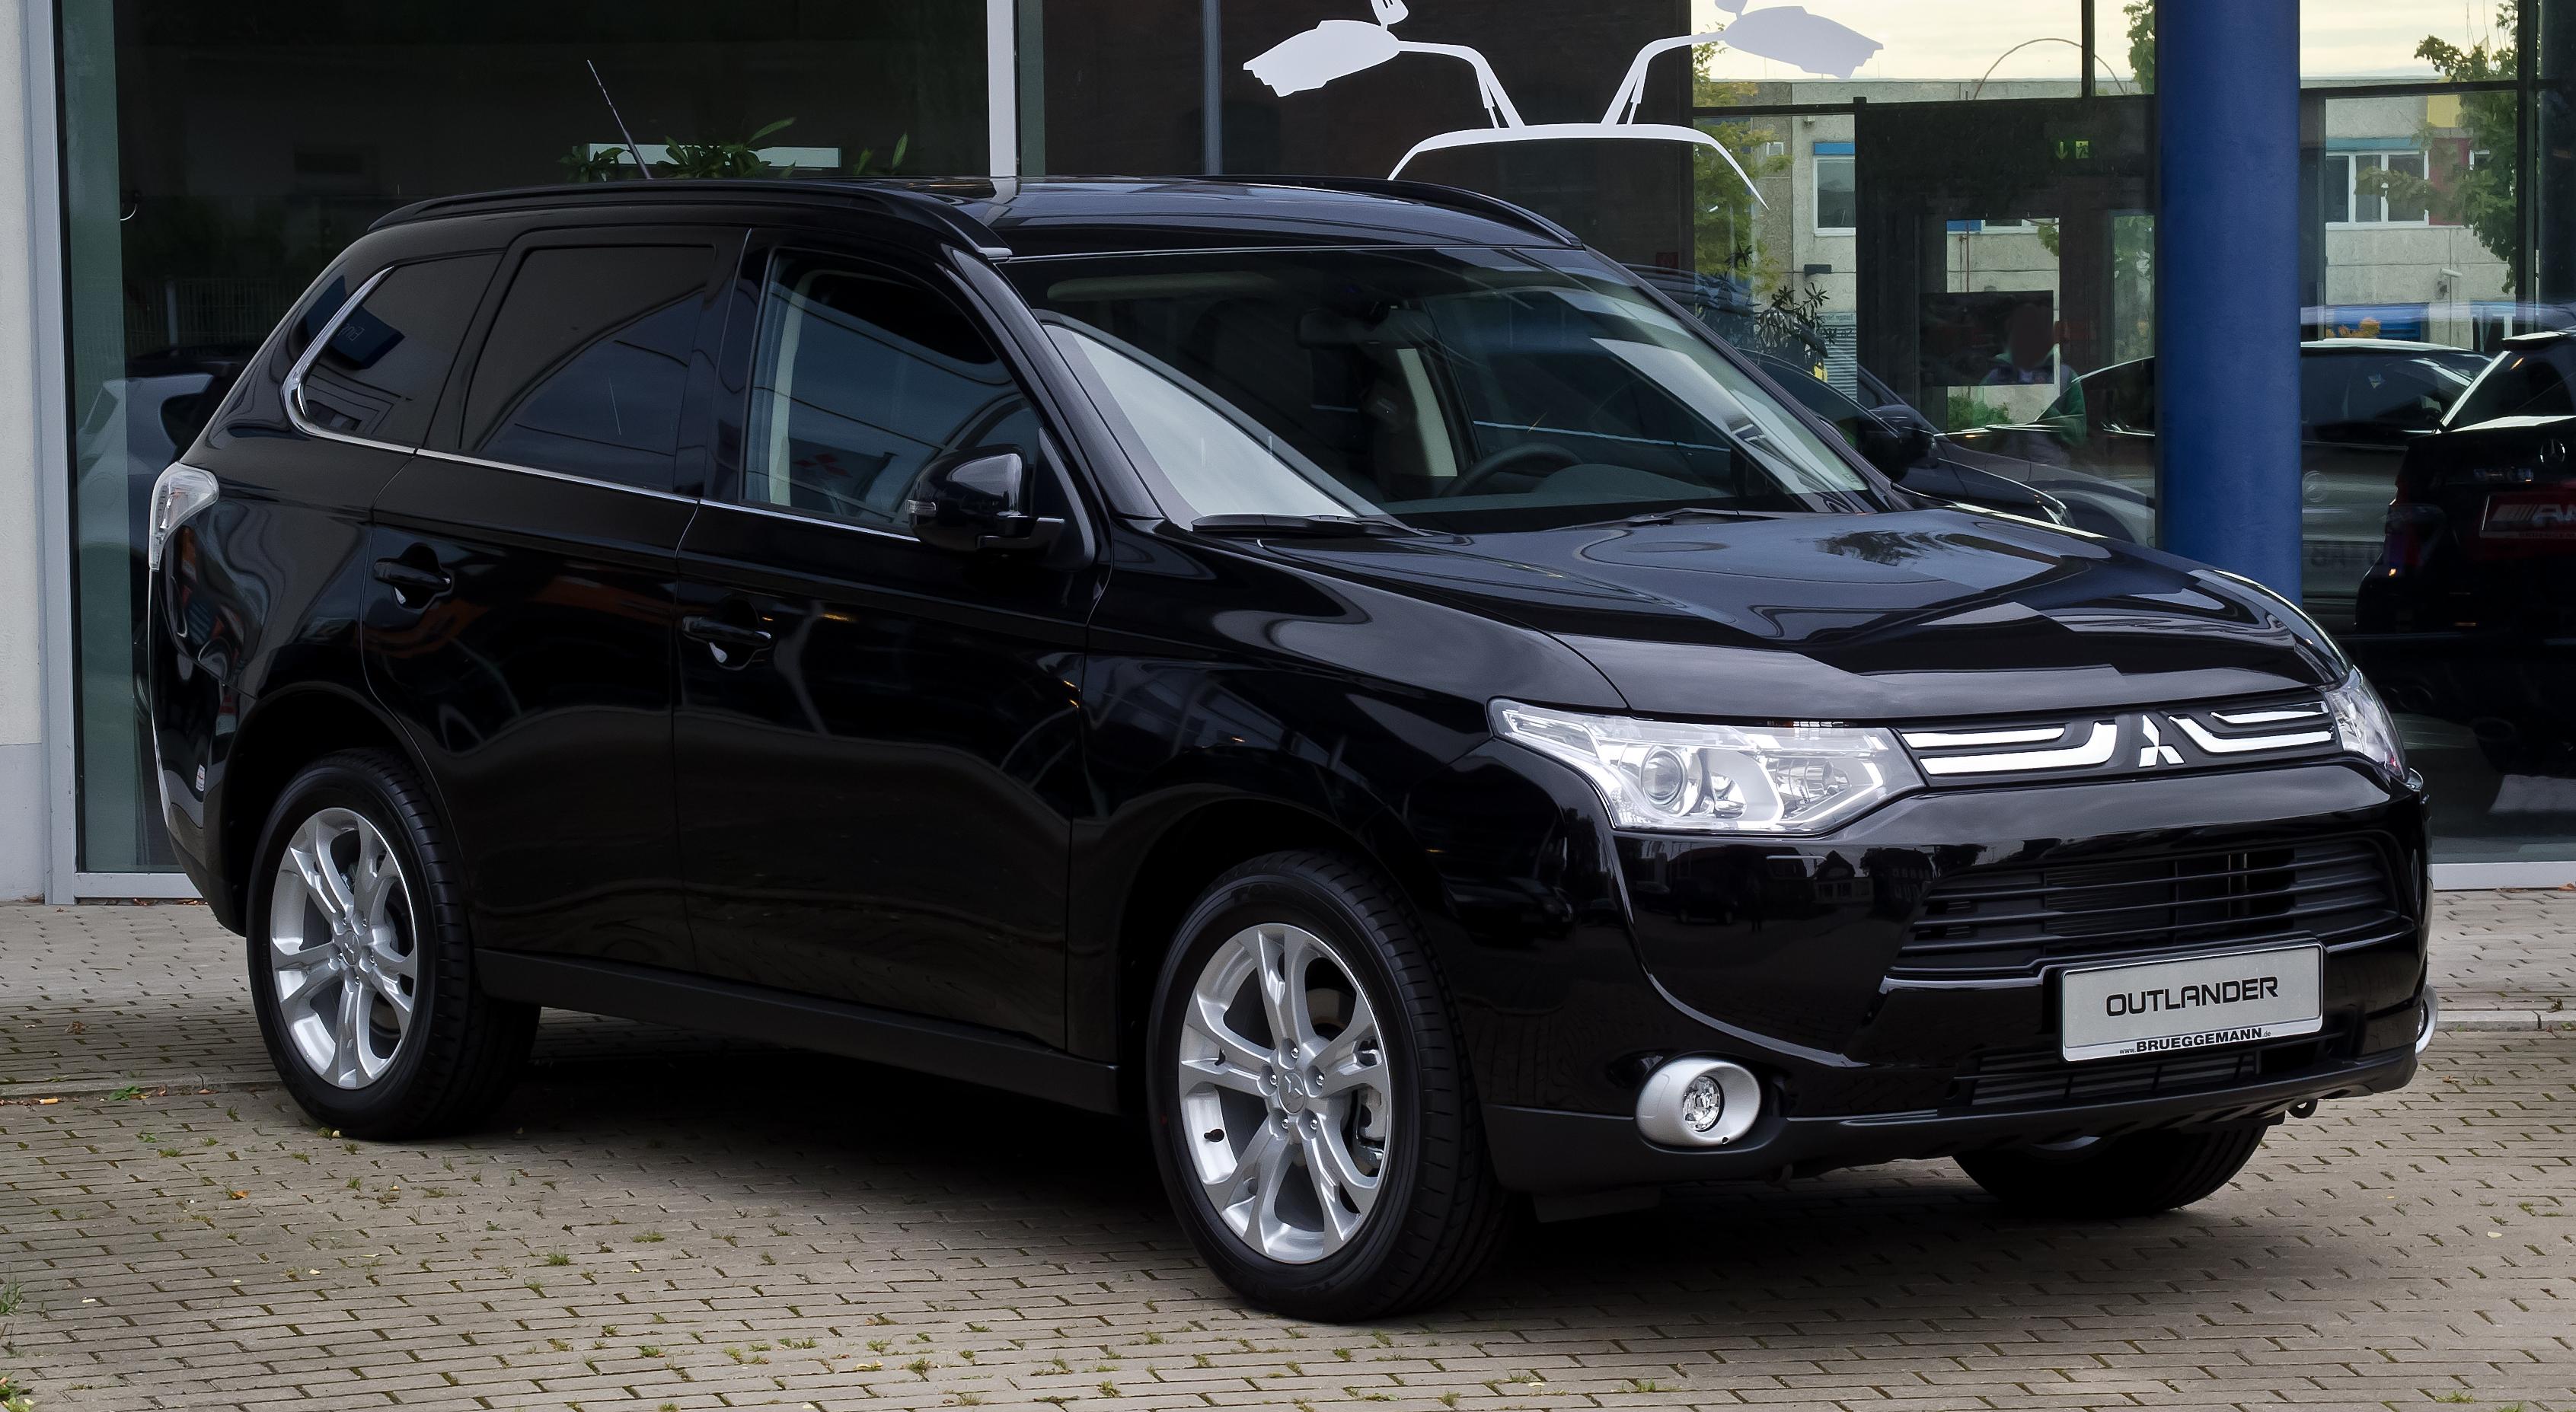 Terenska vozila Mitsubishi_Outlander_2.2_DI-D_4WD_Instyle_(III)_%E2%80%93_Frontansicht,_23._September_2012,_Hilden